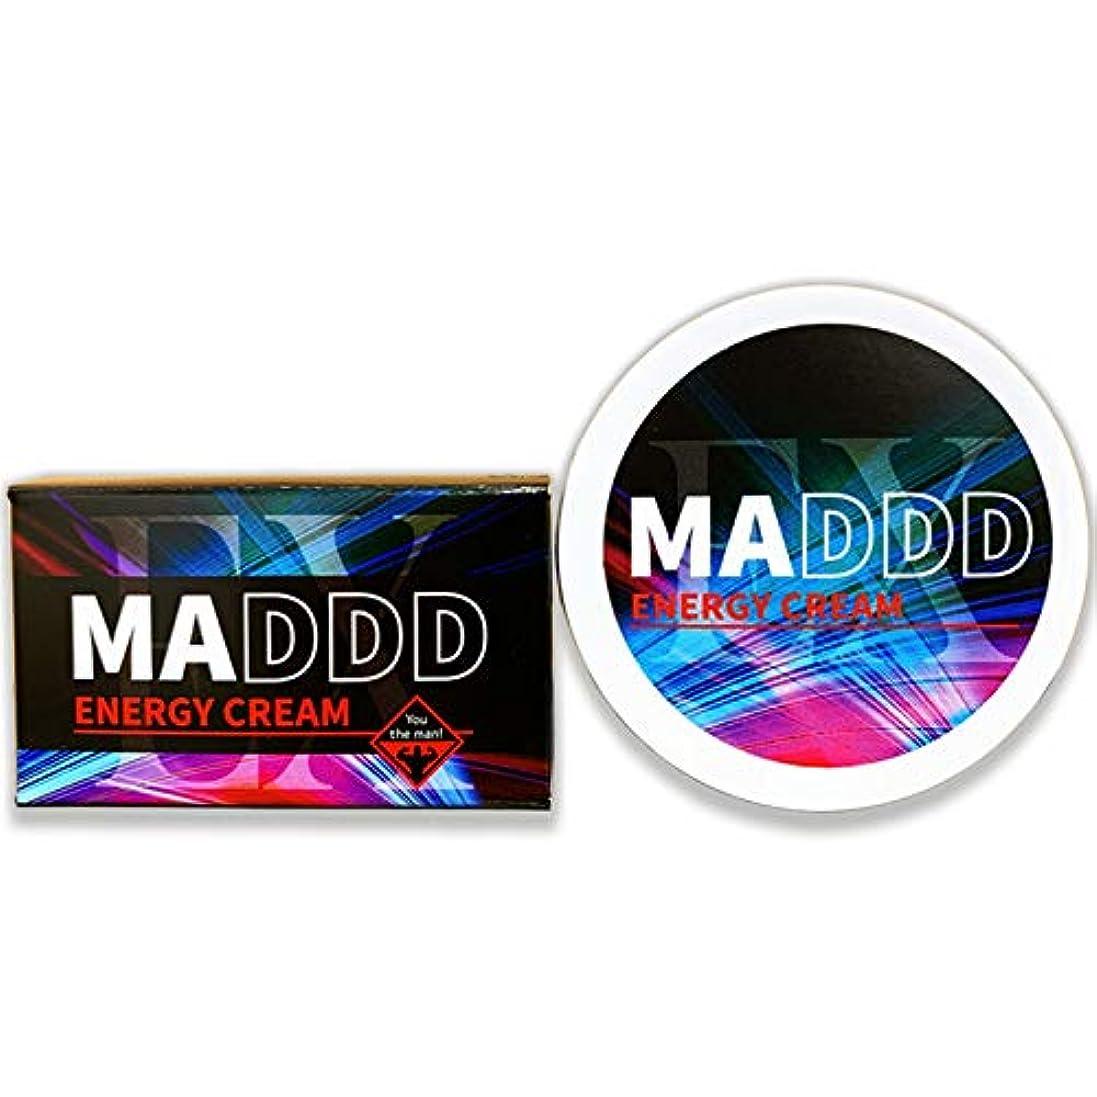 地図王族防ぐMADDD EX 増大クリーム 自信 持続力 厳選成分 50g (単品購入)